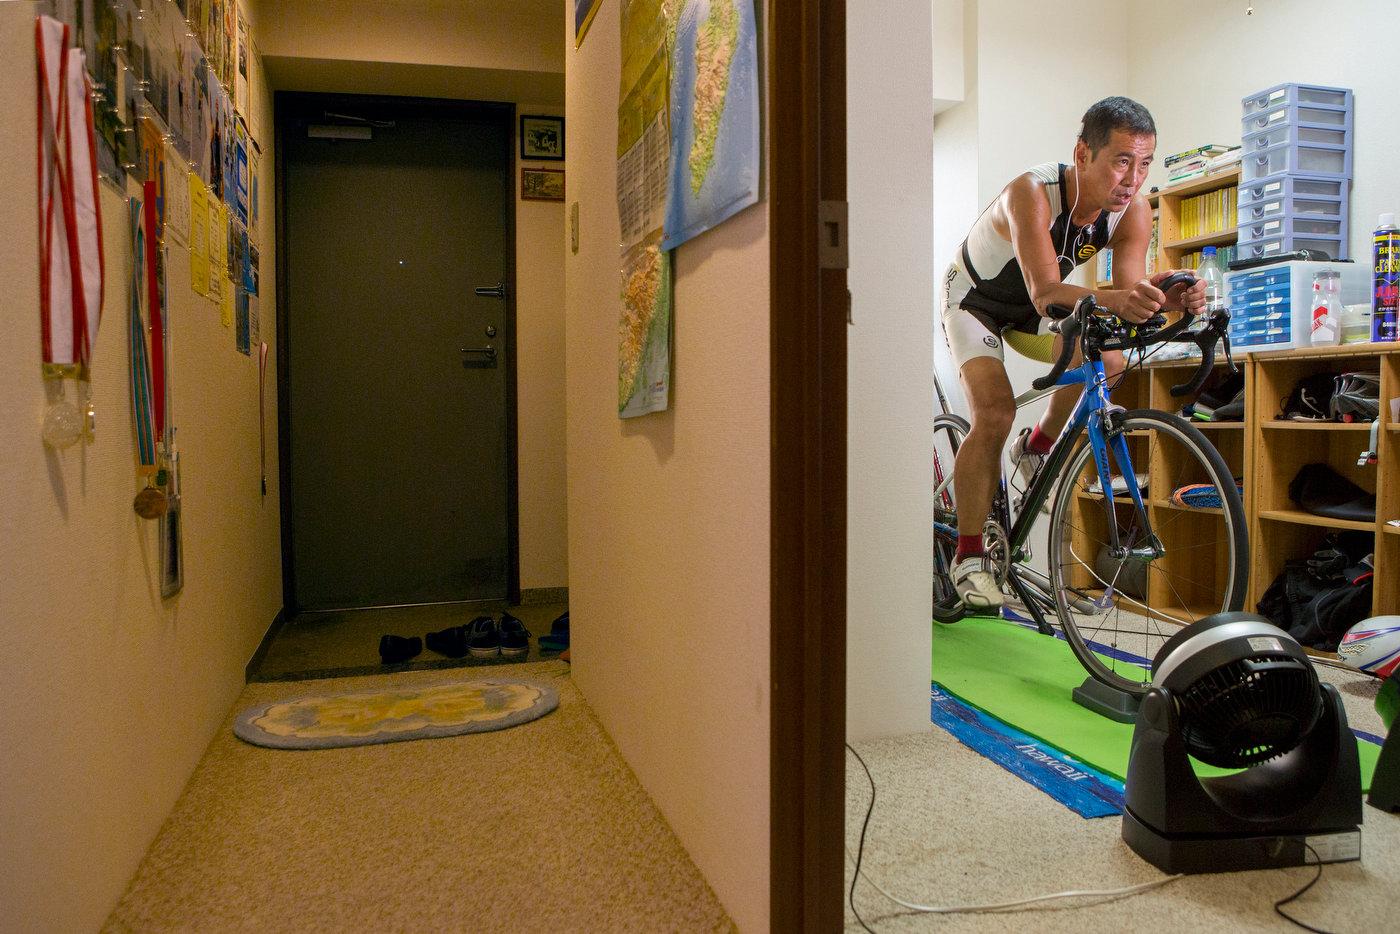 Kato-San, training for Ironman, Tokyo.